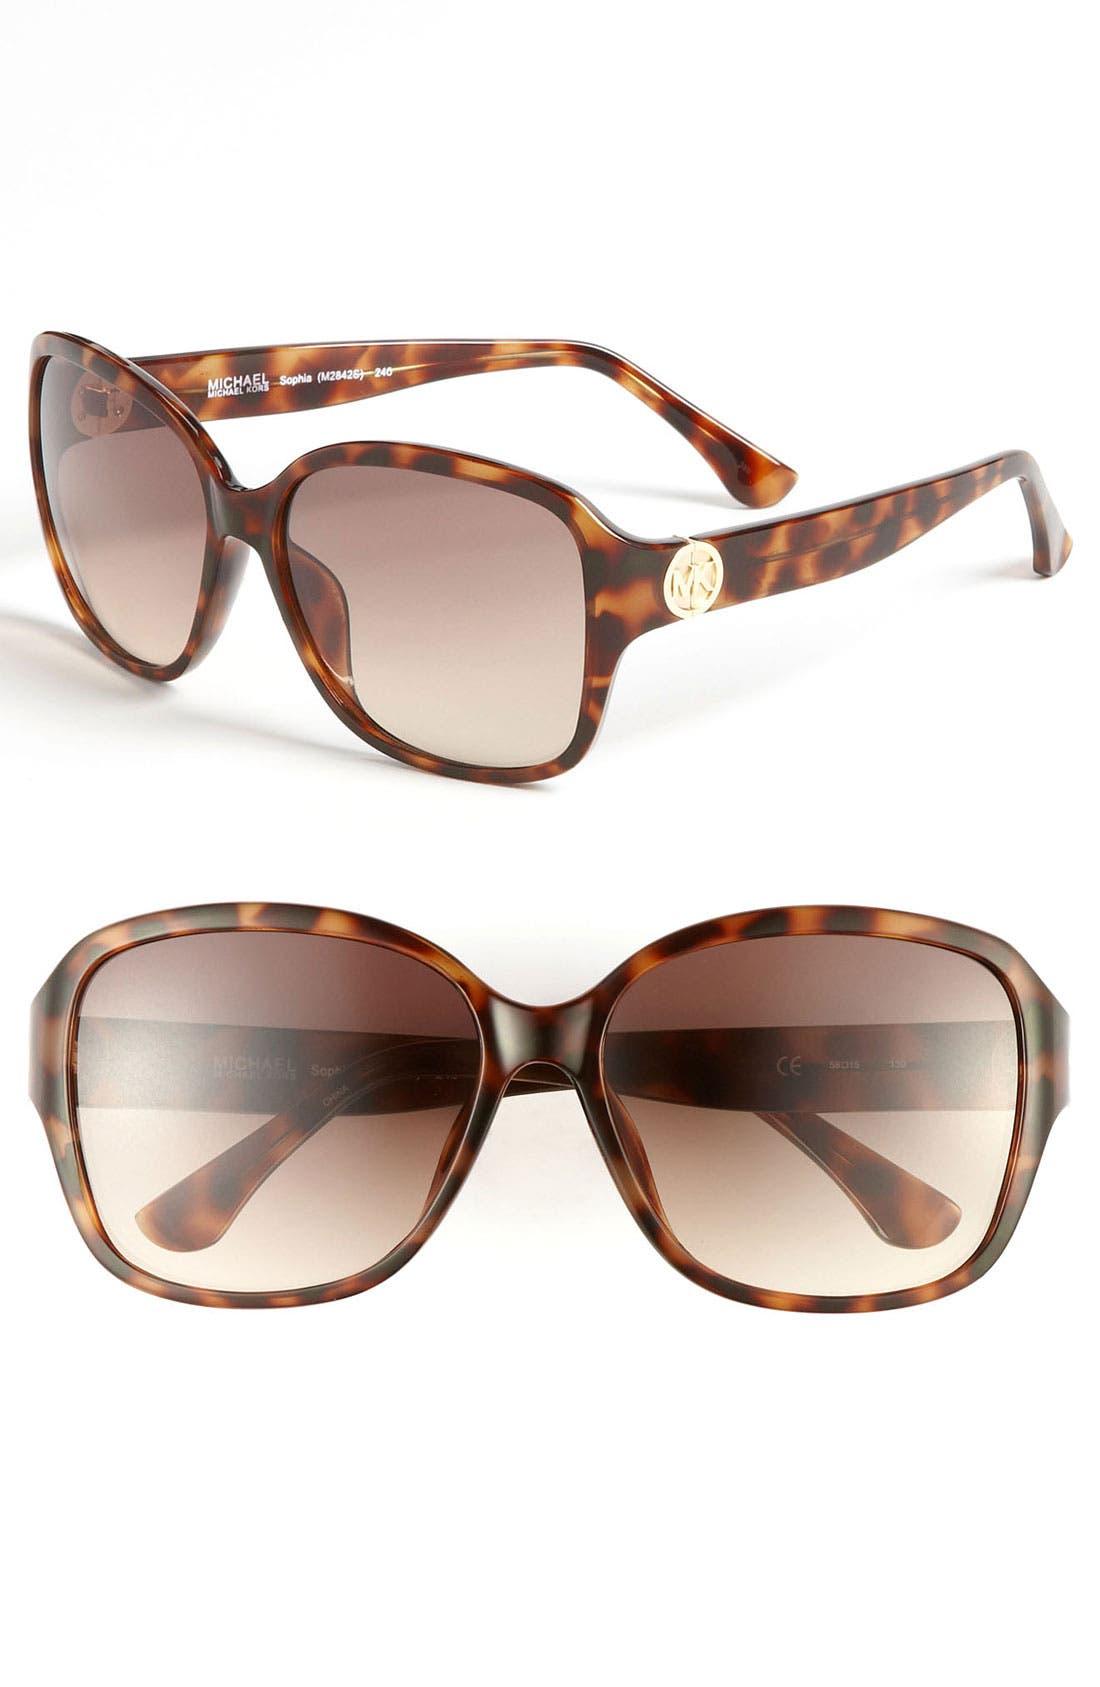 Alternate Image 1 Selected - MICHAEL Michael Kors 'Sophia' 58mm Sunglasses